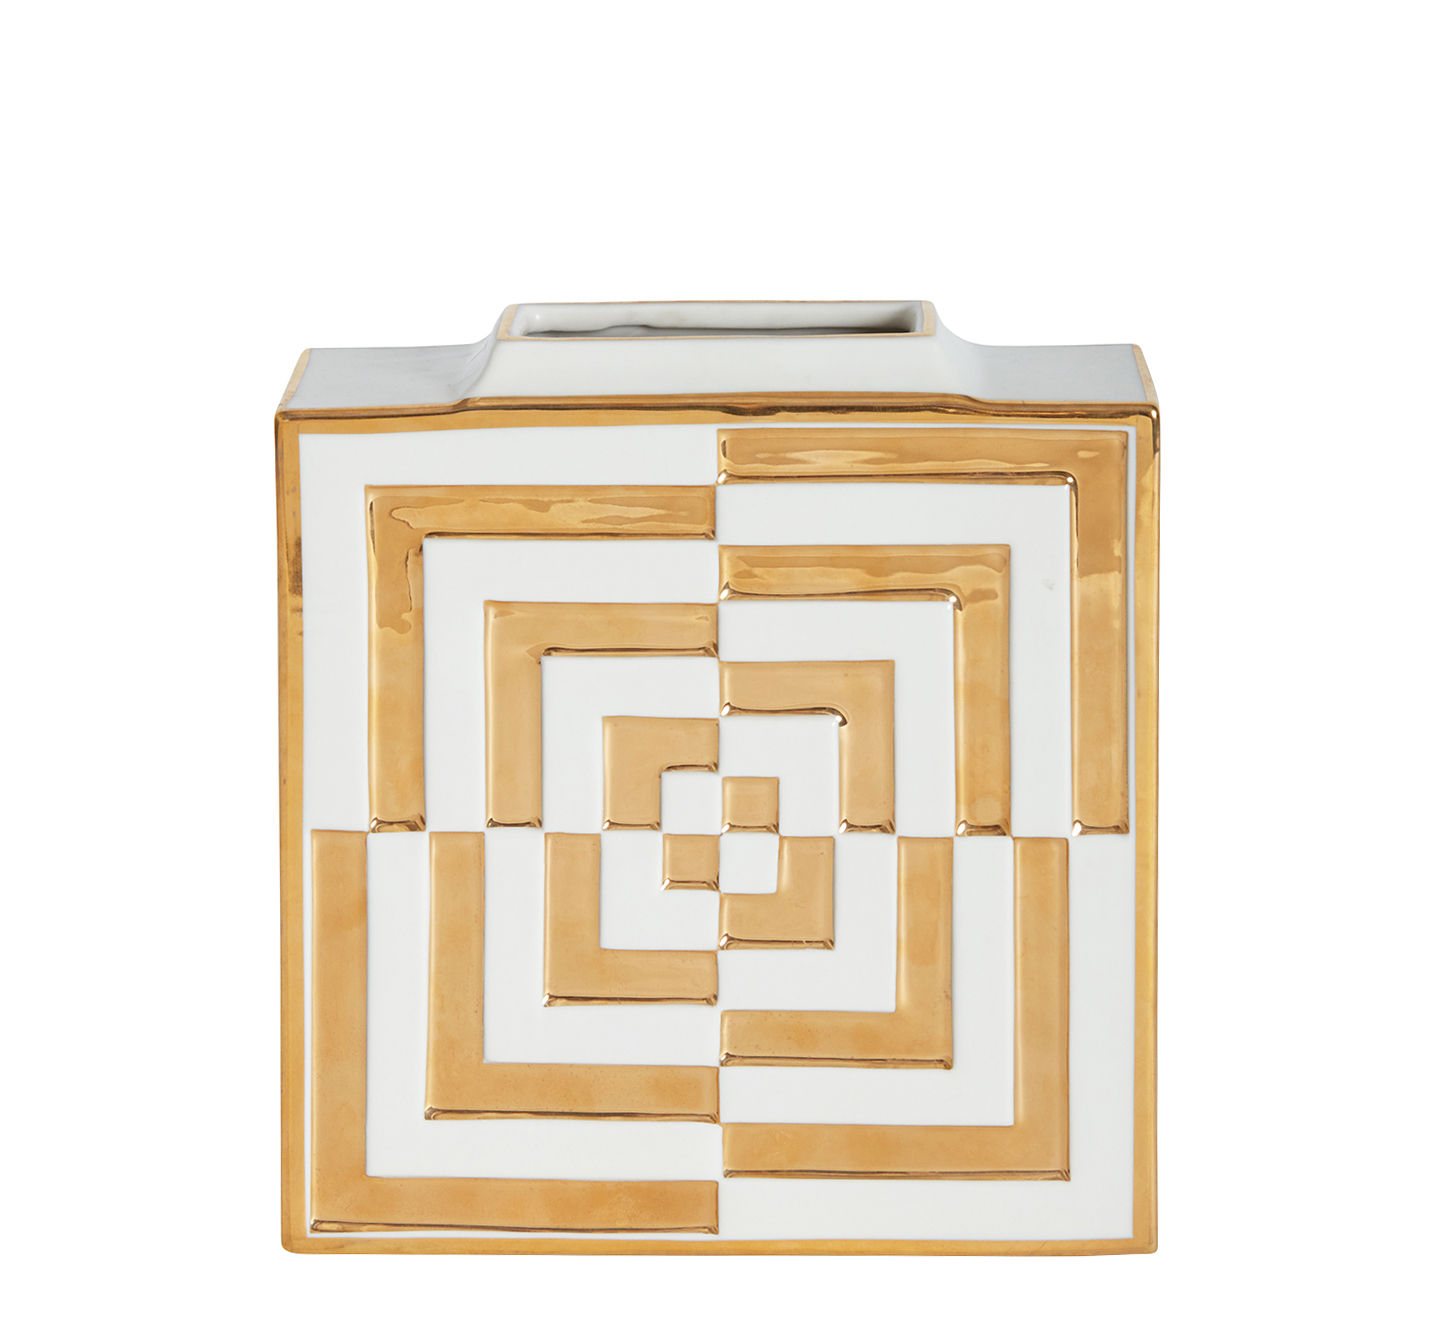 Decoration - Vases - Futura Op Art Vase - / Porcelain & gold by Jonathan Adler - White & gold - China, Gold